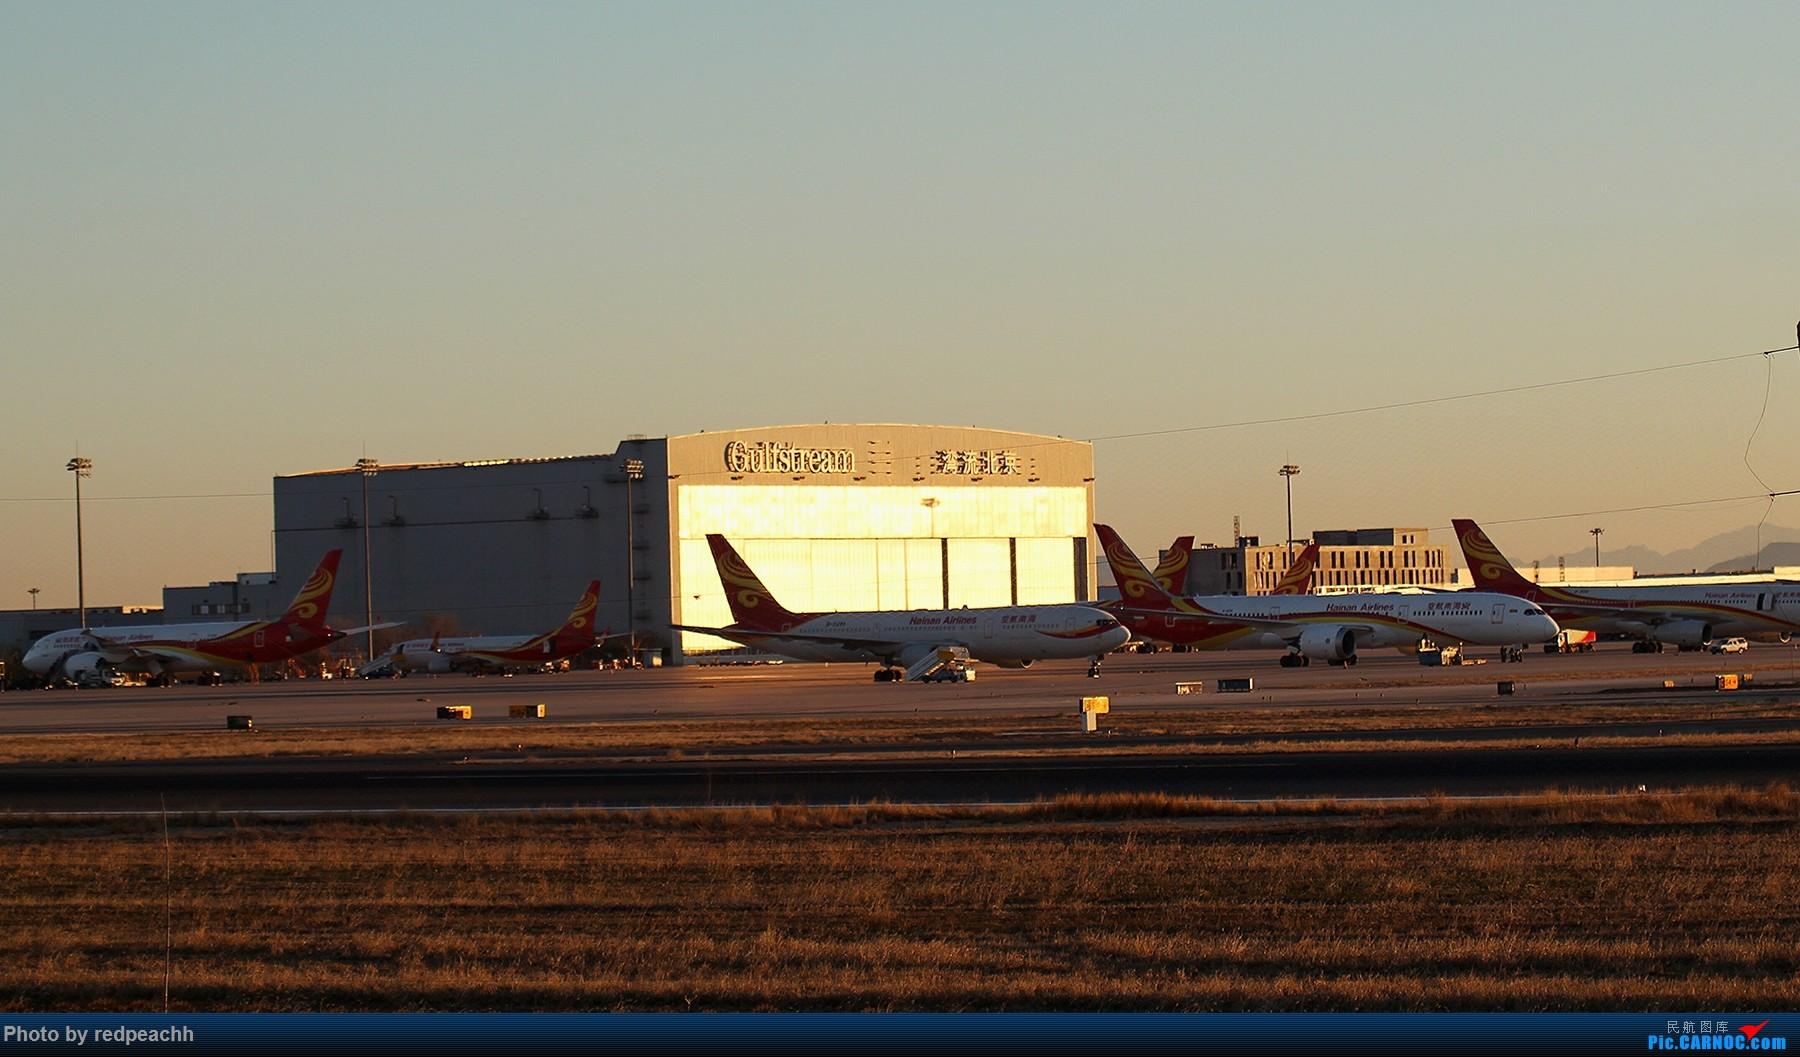 Re:[原创]河北人为拍机而首都机场2日游虽常规但值得纪念(36L) BOEING 787-8  36L 中国北京首都国际机场